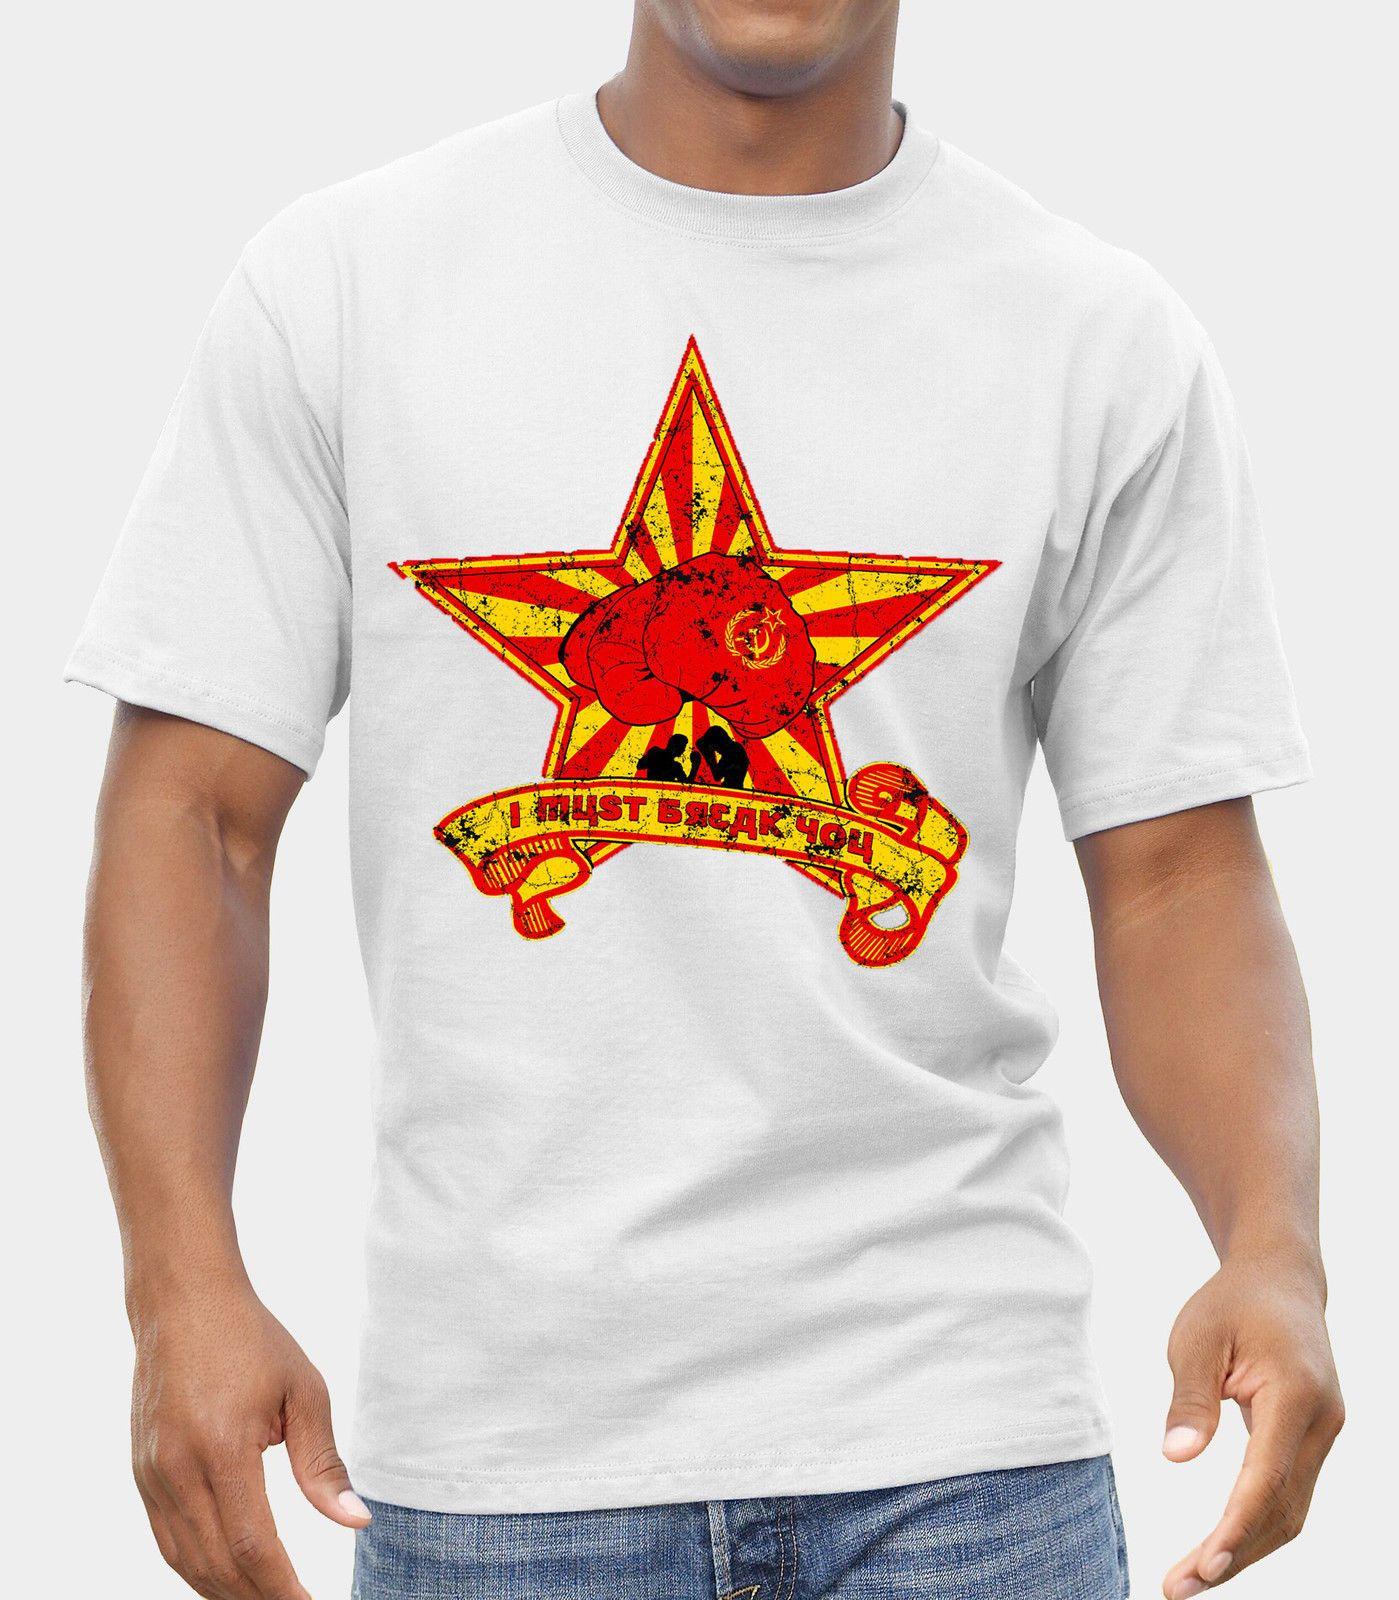 I Must Break You Drago LOGO T-SHIRT FRUIT OF THE LOOM S-XXL Custom t shirt  logo text photo Mens Womens T-shirt men